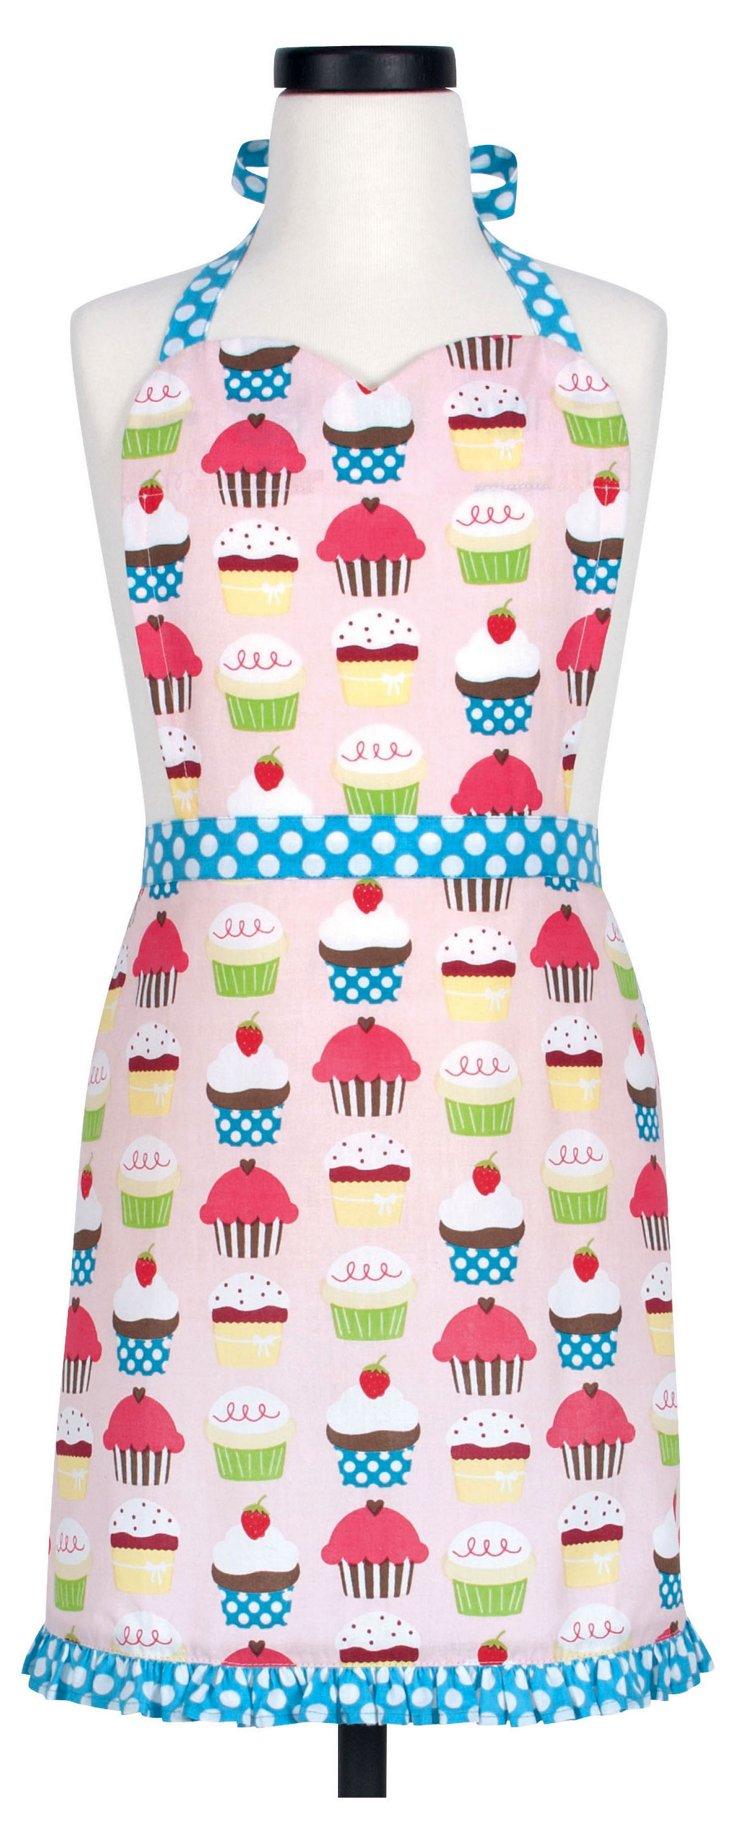 Cupcake Kid's Apron